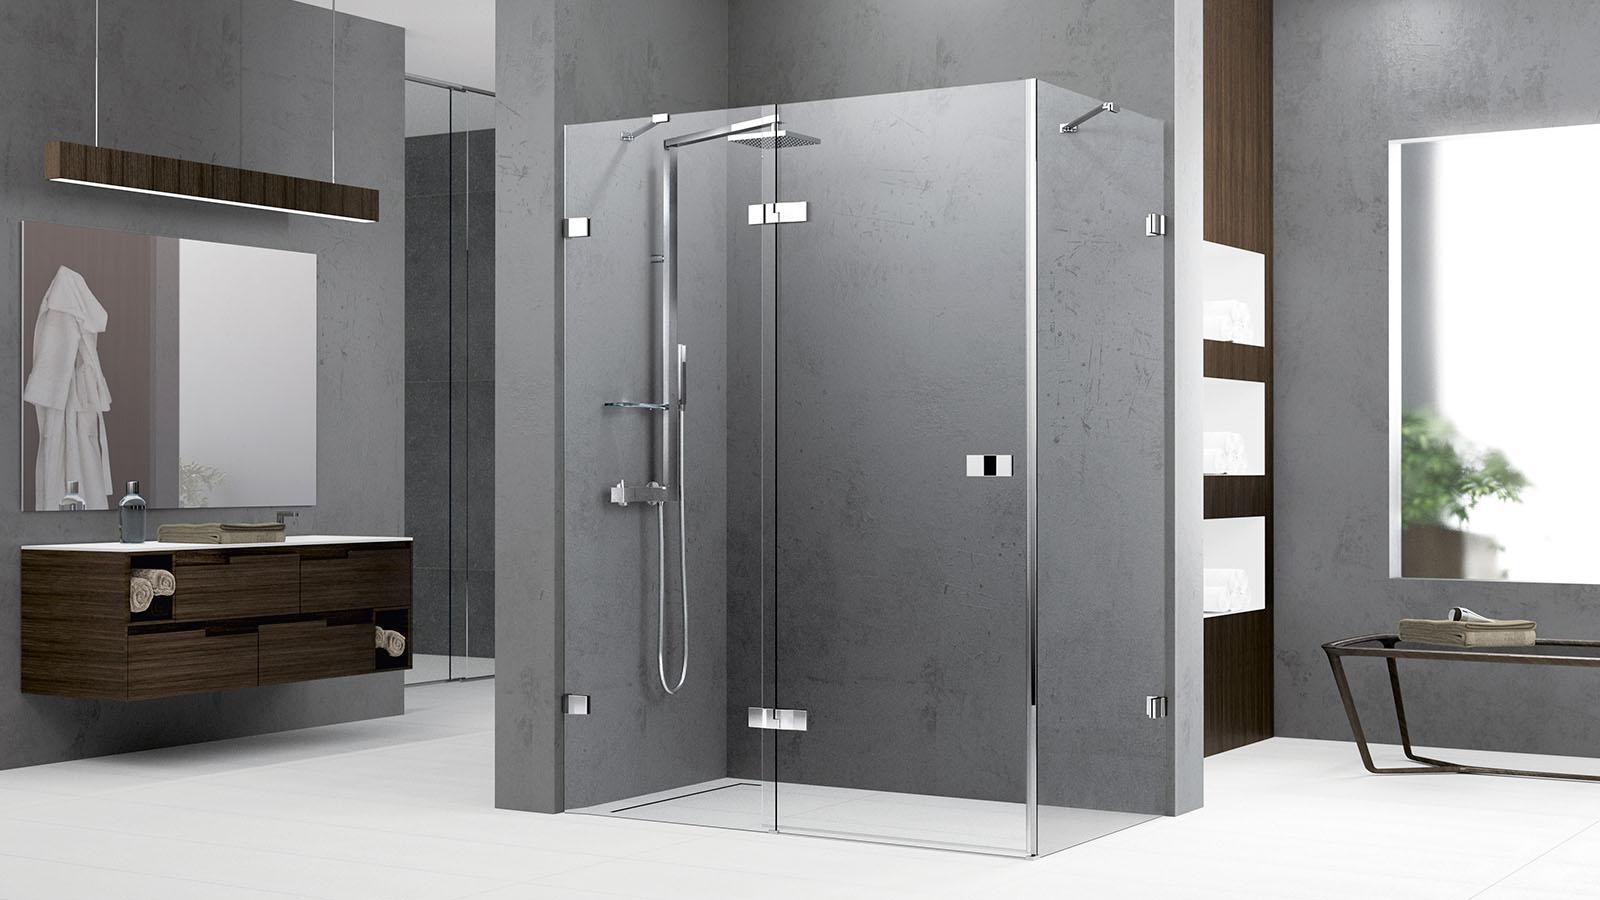 Salle de bains sanitaires for Novellini arredo bagno